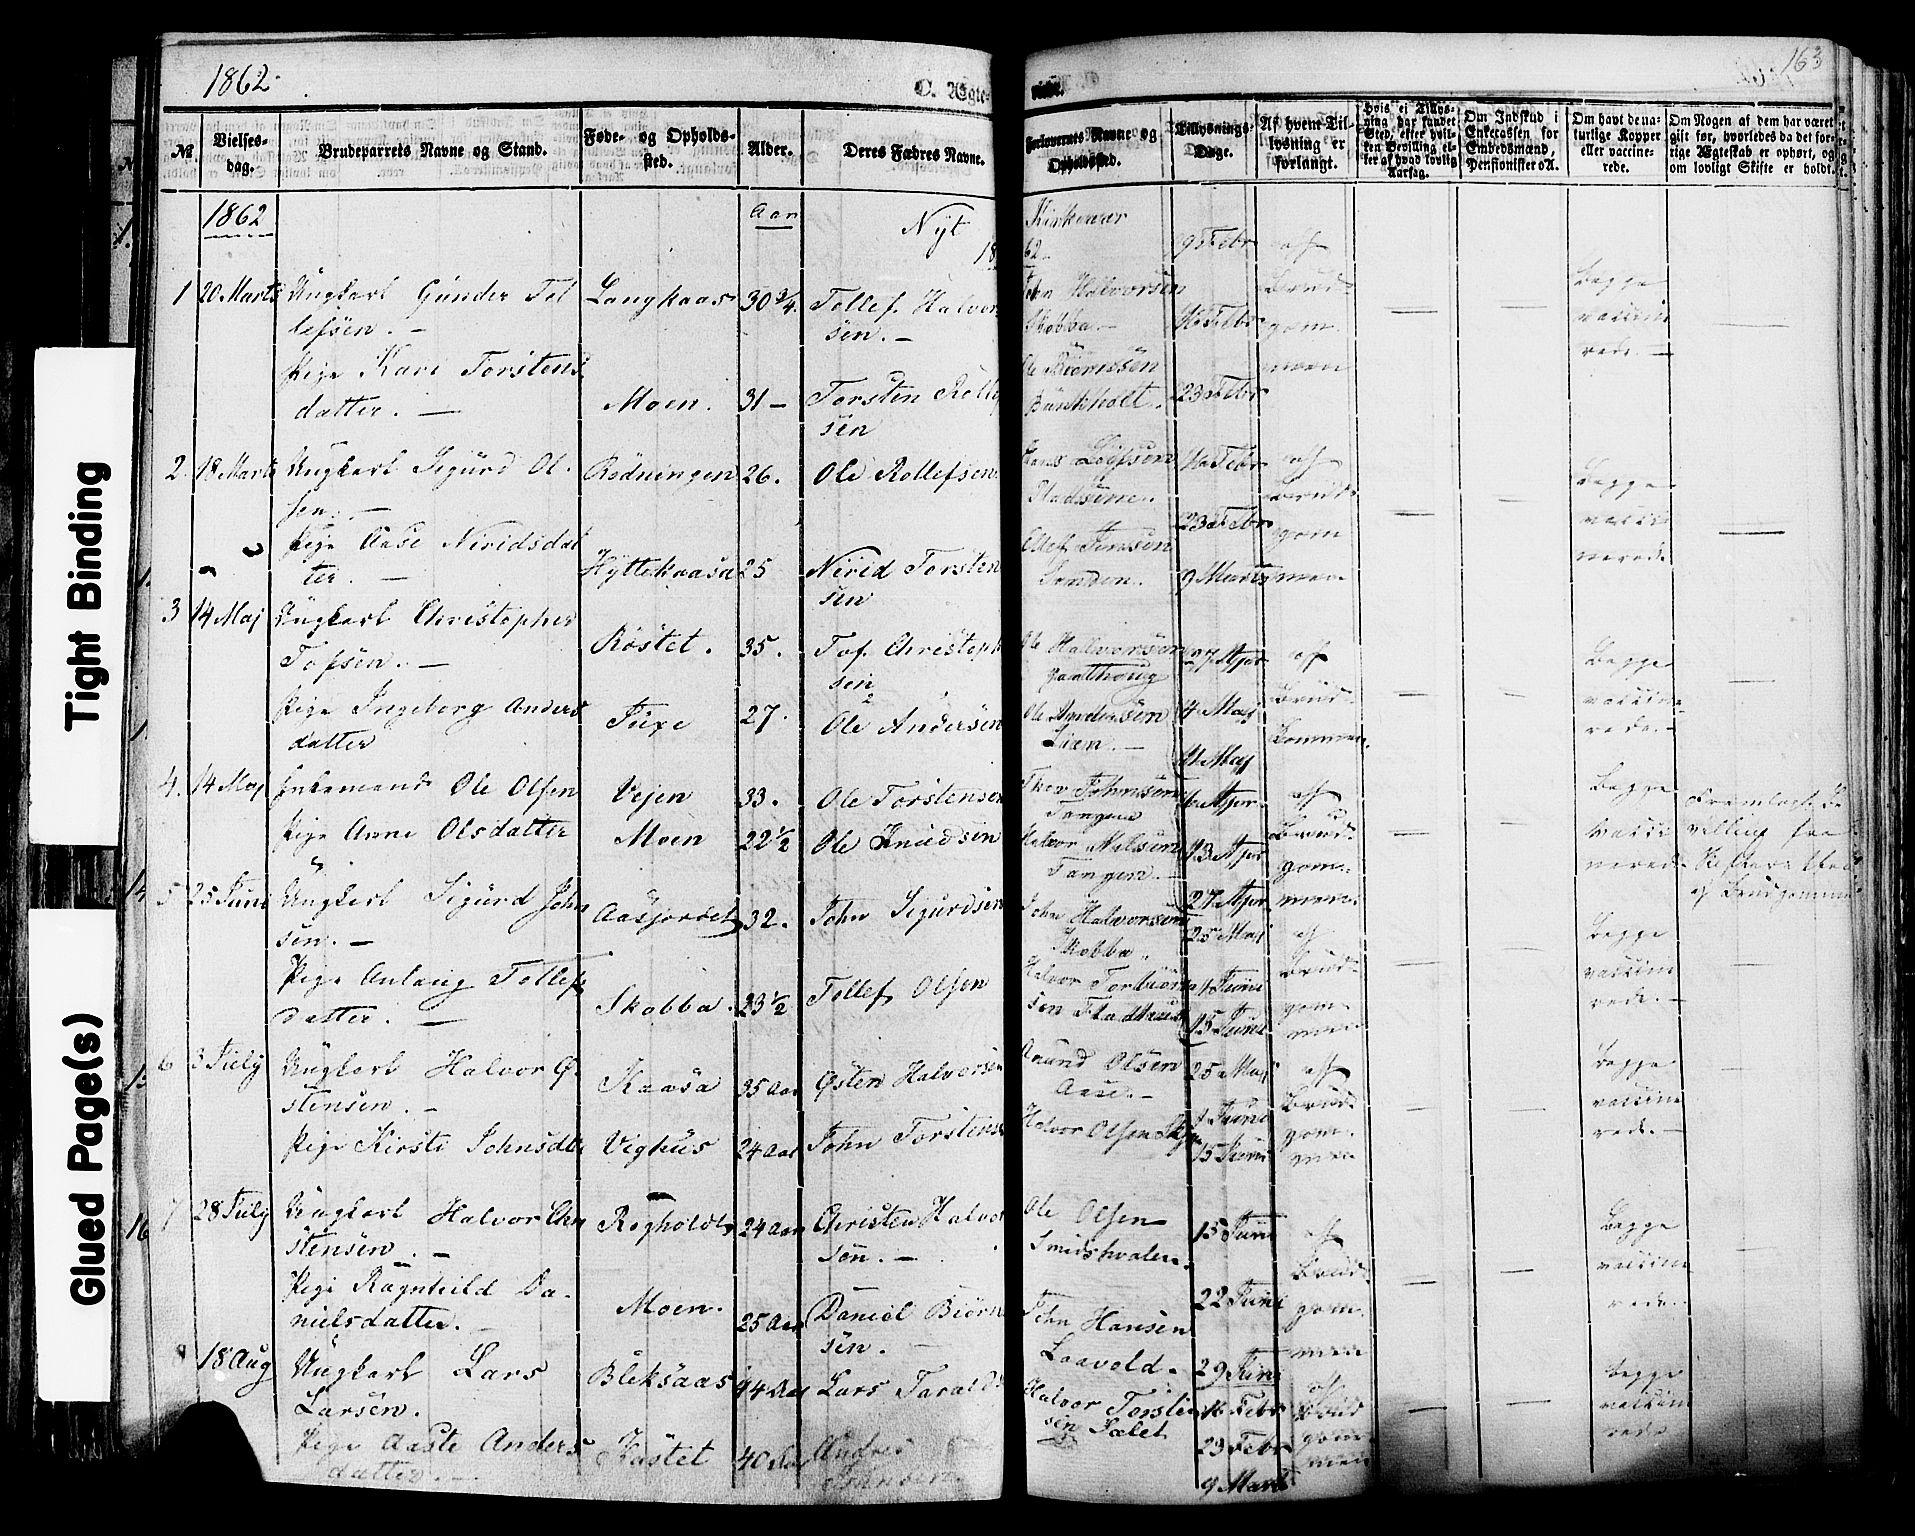 SAKO, Sauherad kirkebøker, F/Fa/L0007: Ministerialbok nr. I 7, 1851-1873, s. 163